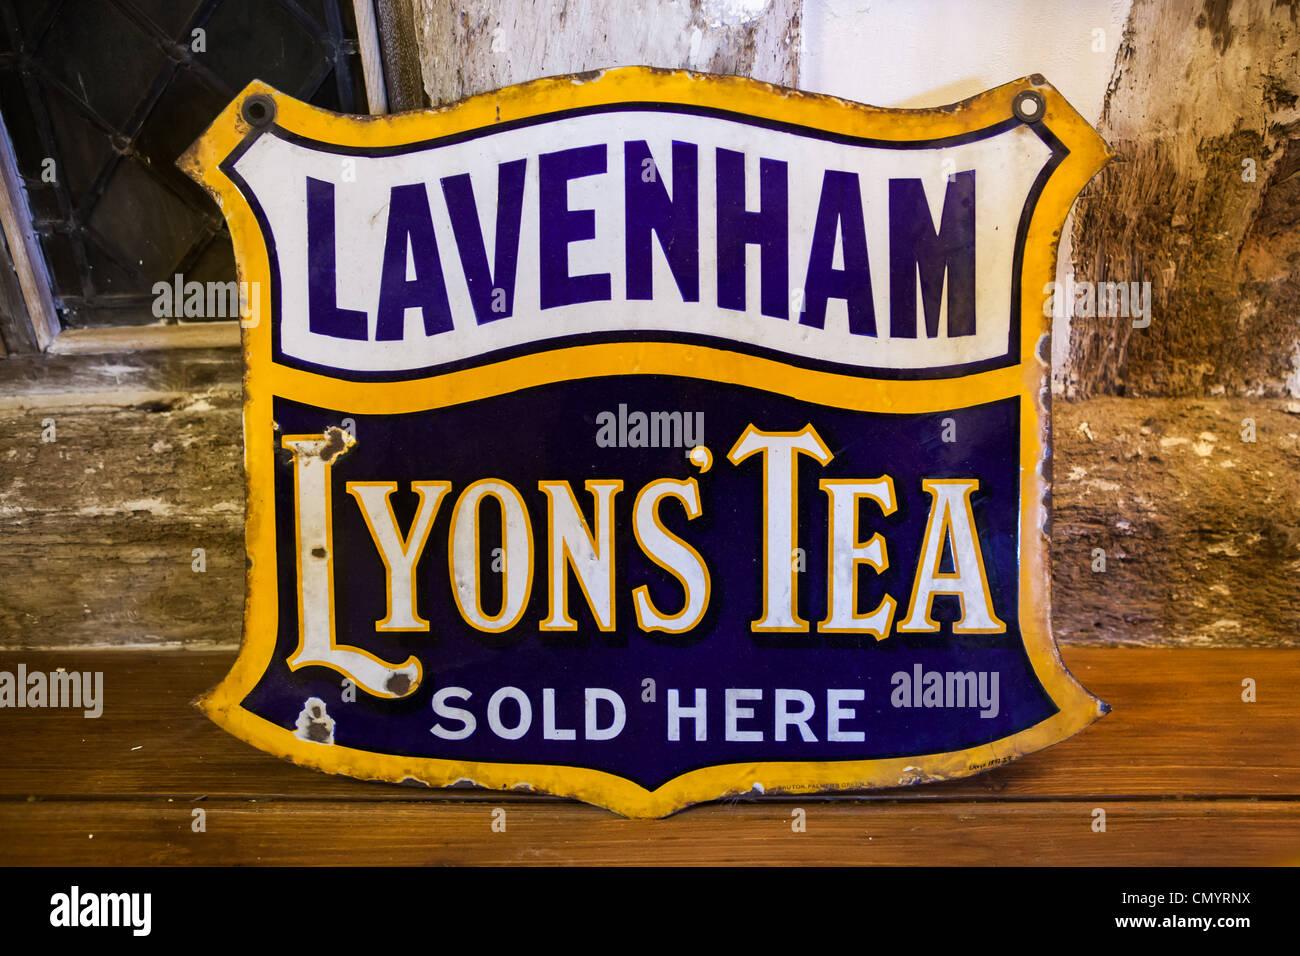 Old Lavenham Lyons' Tea sign, Lavenham, Suffolk - Stock Image